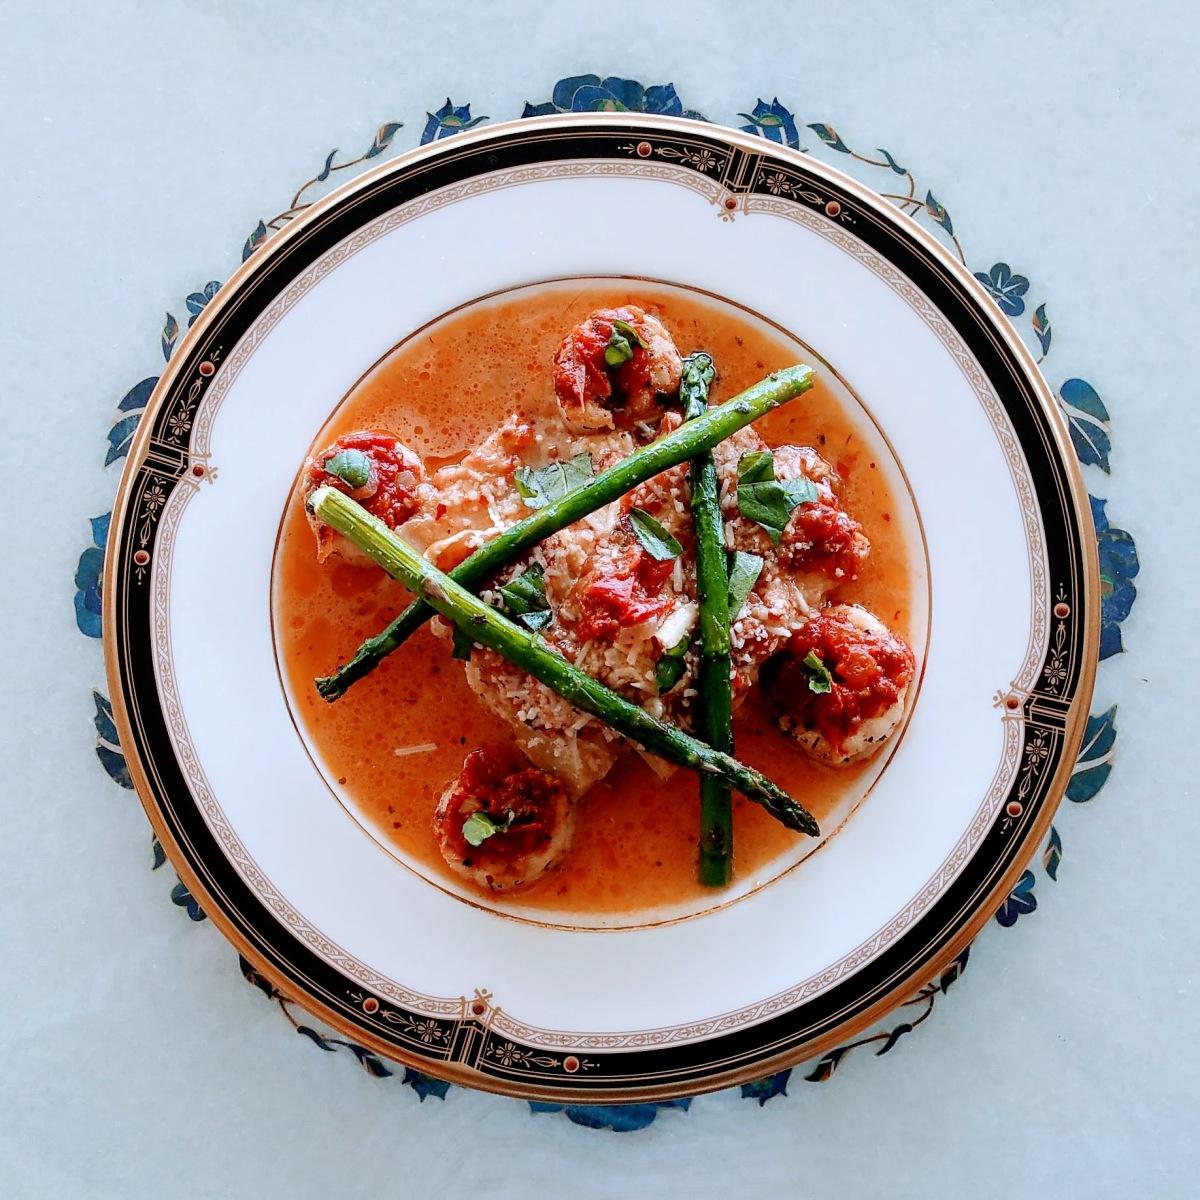 Patty Pan Parmesan Plated Meal